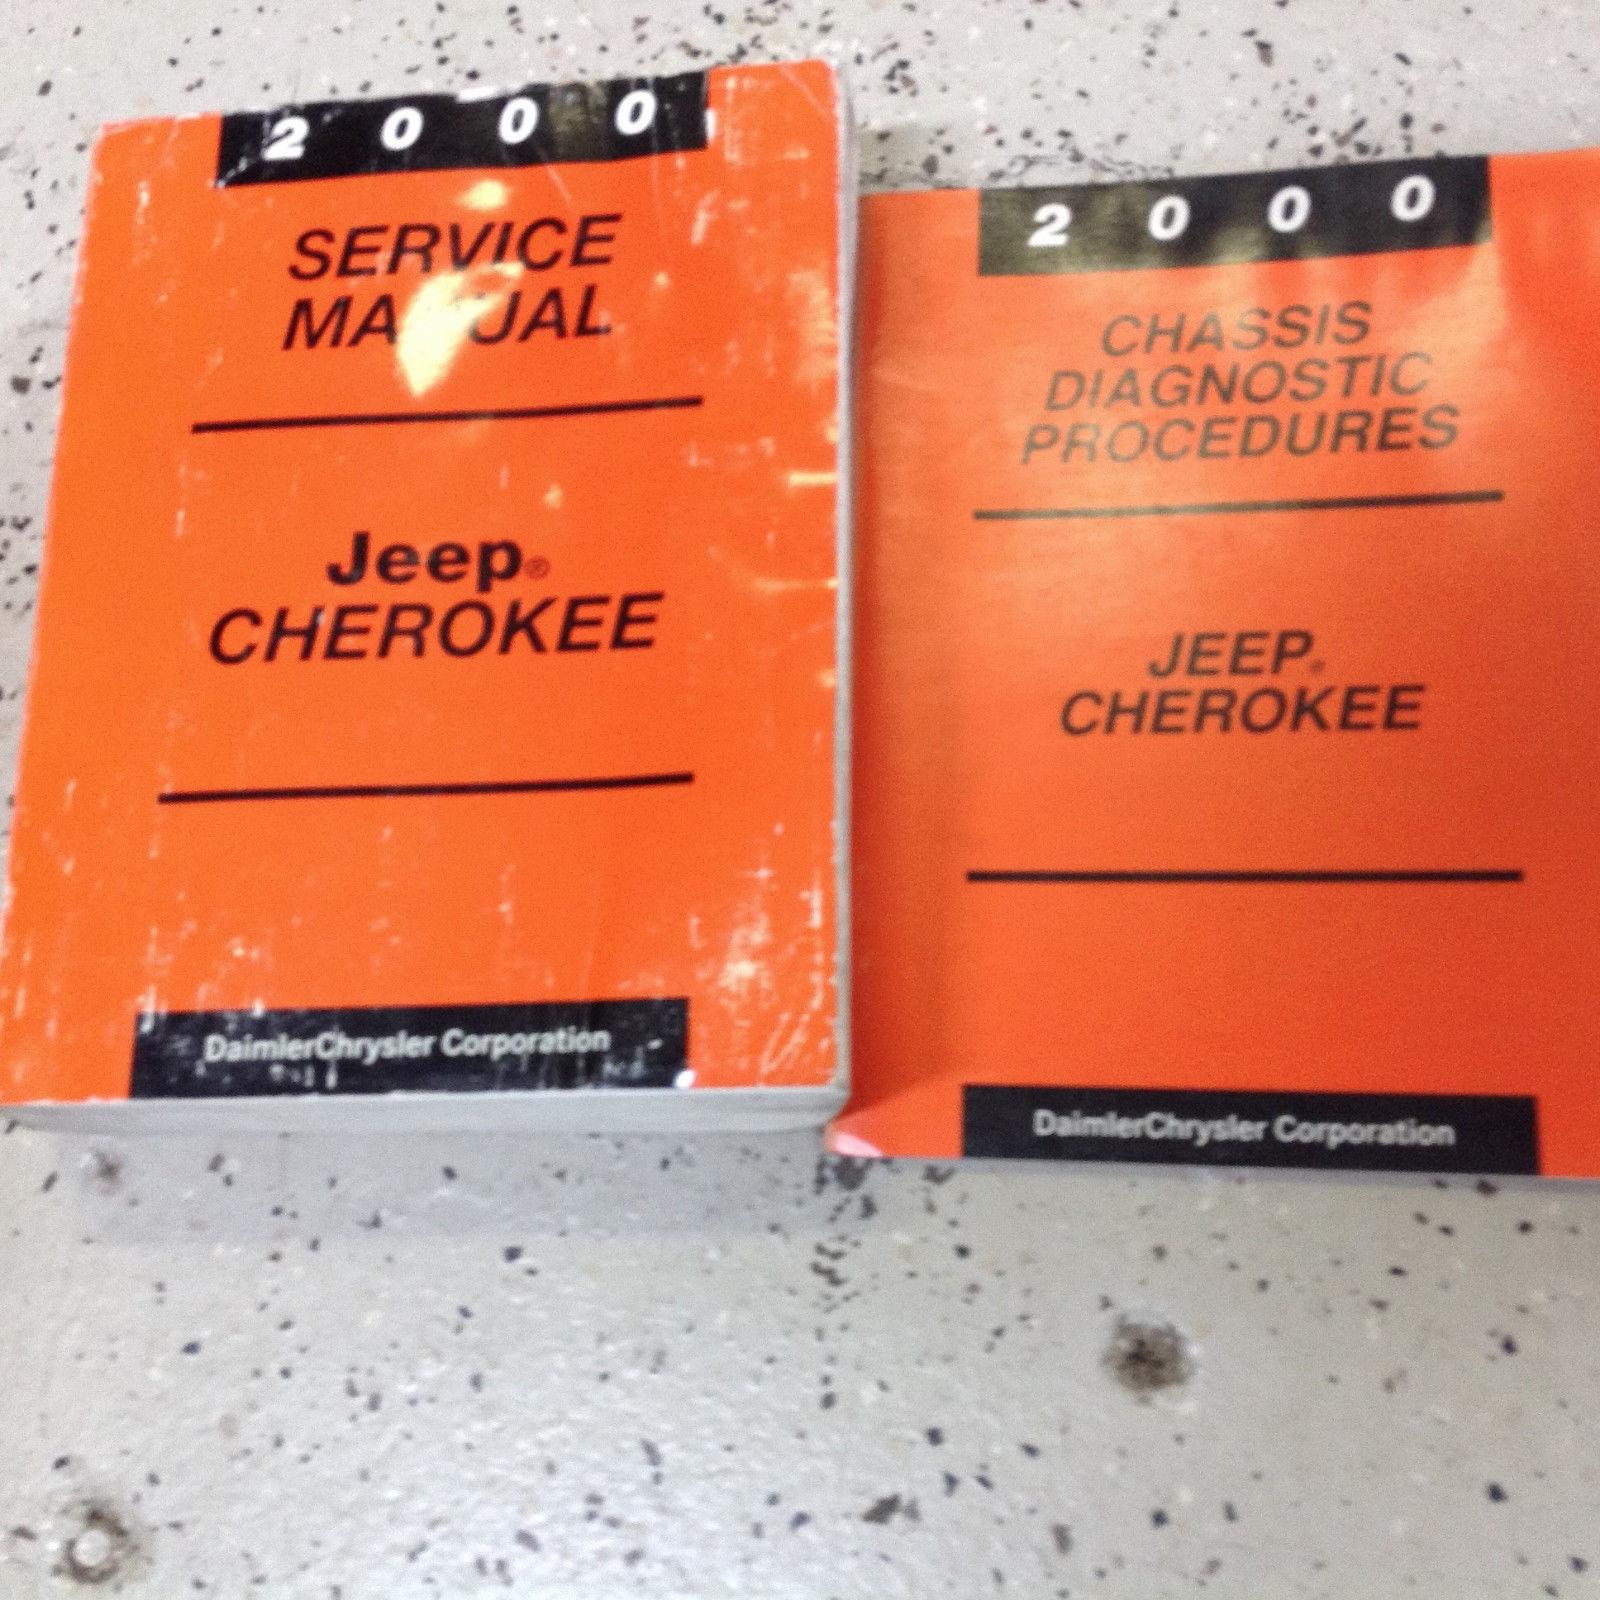 2000 JEEP CHEROKEE Service Repair Shop Manual Set W Chassis Diagnostic Book  OEM